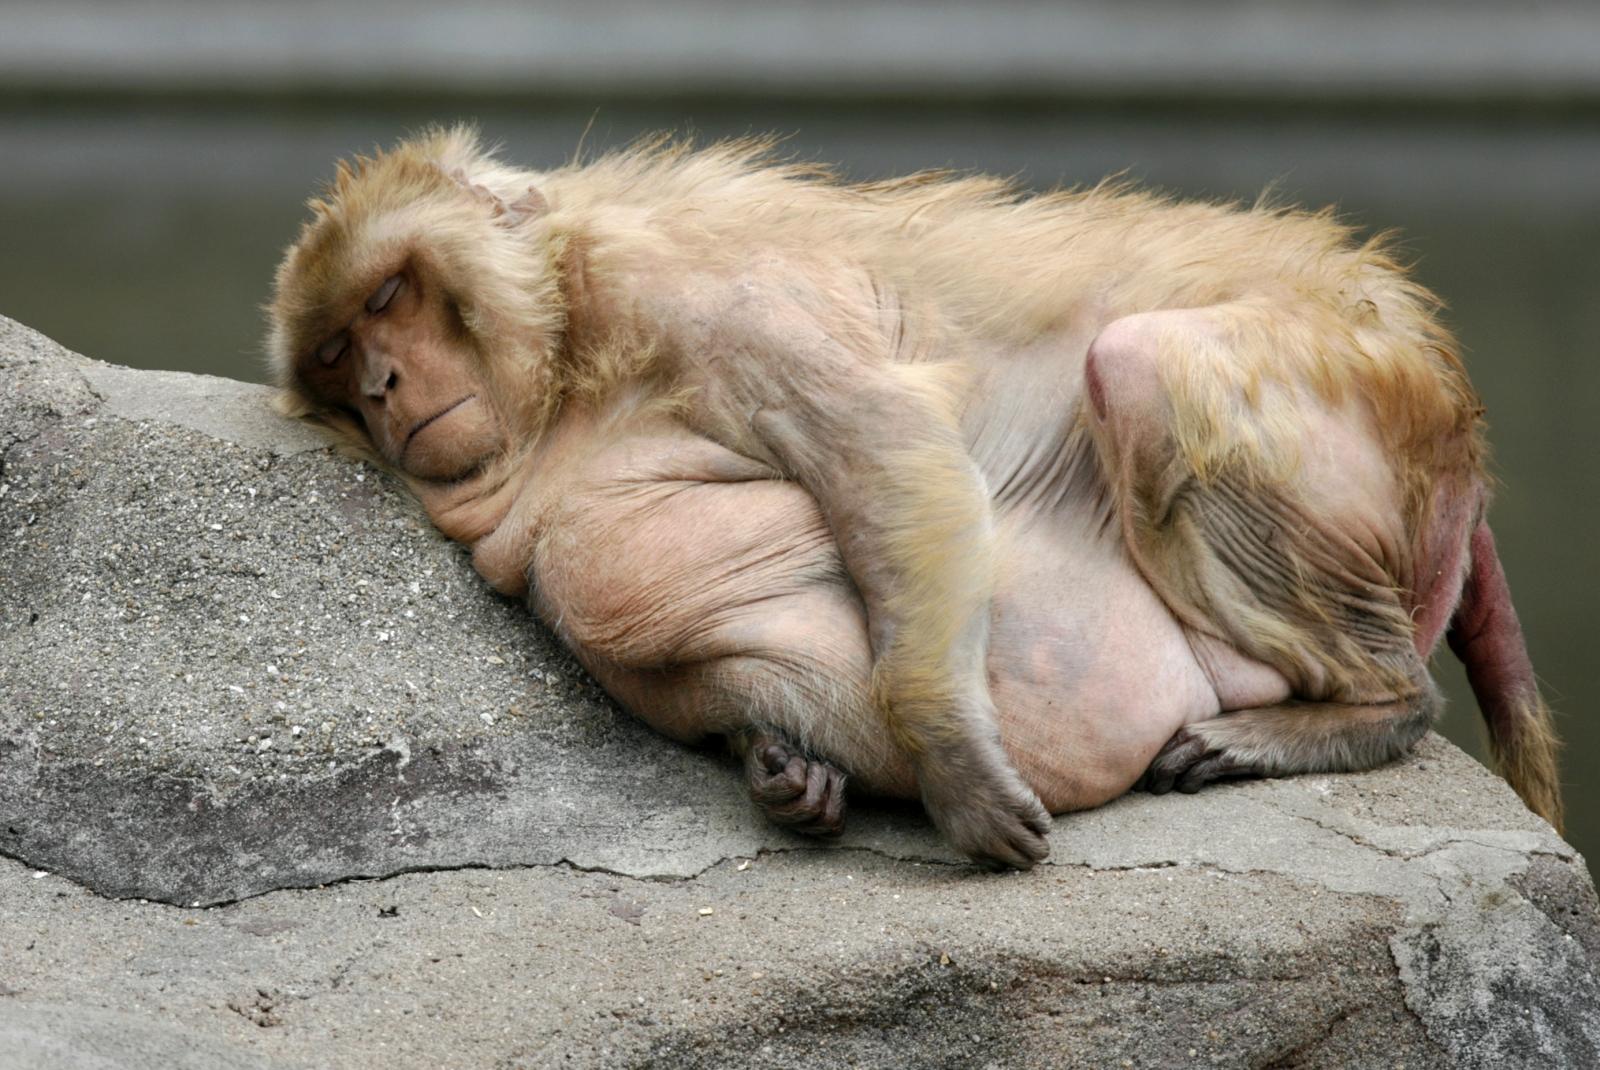 Fattest Monkey In The World Monkeys Trained To Dri...